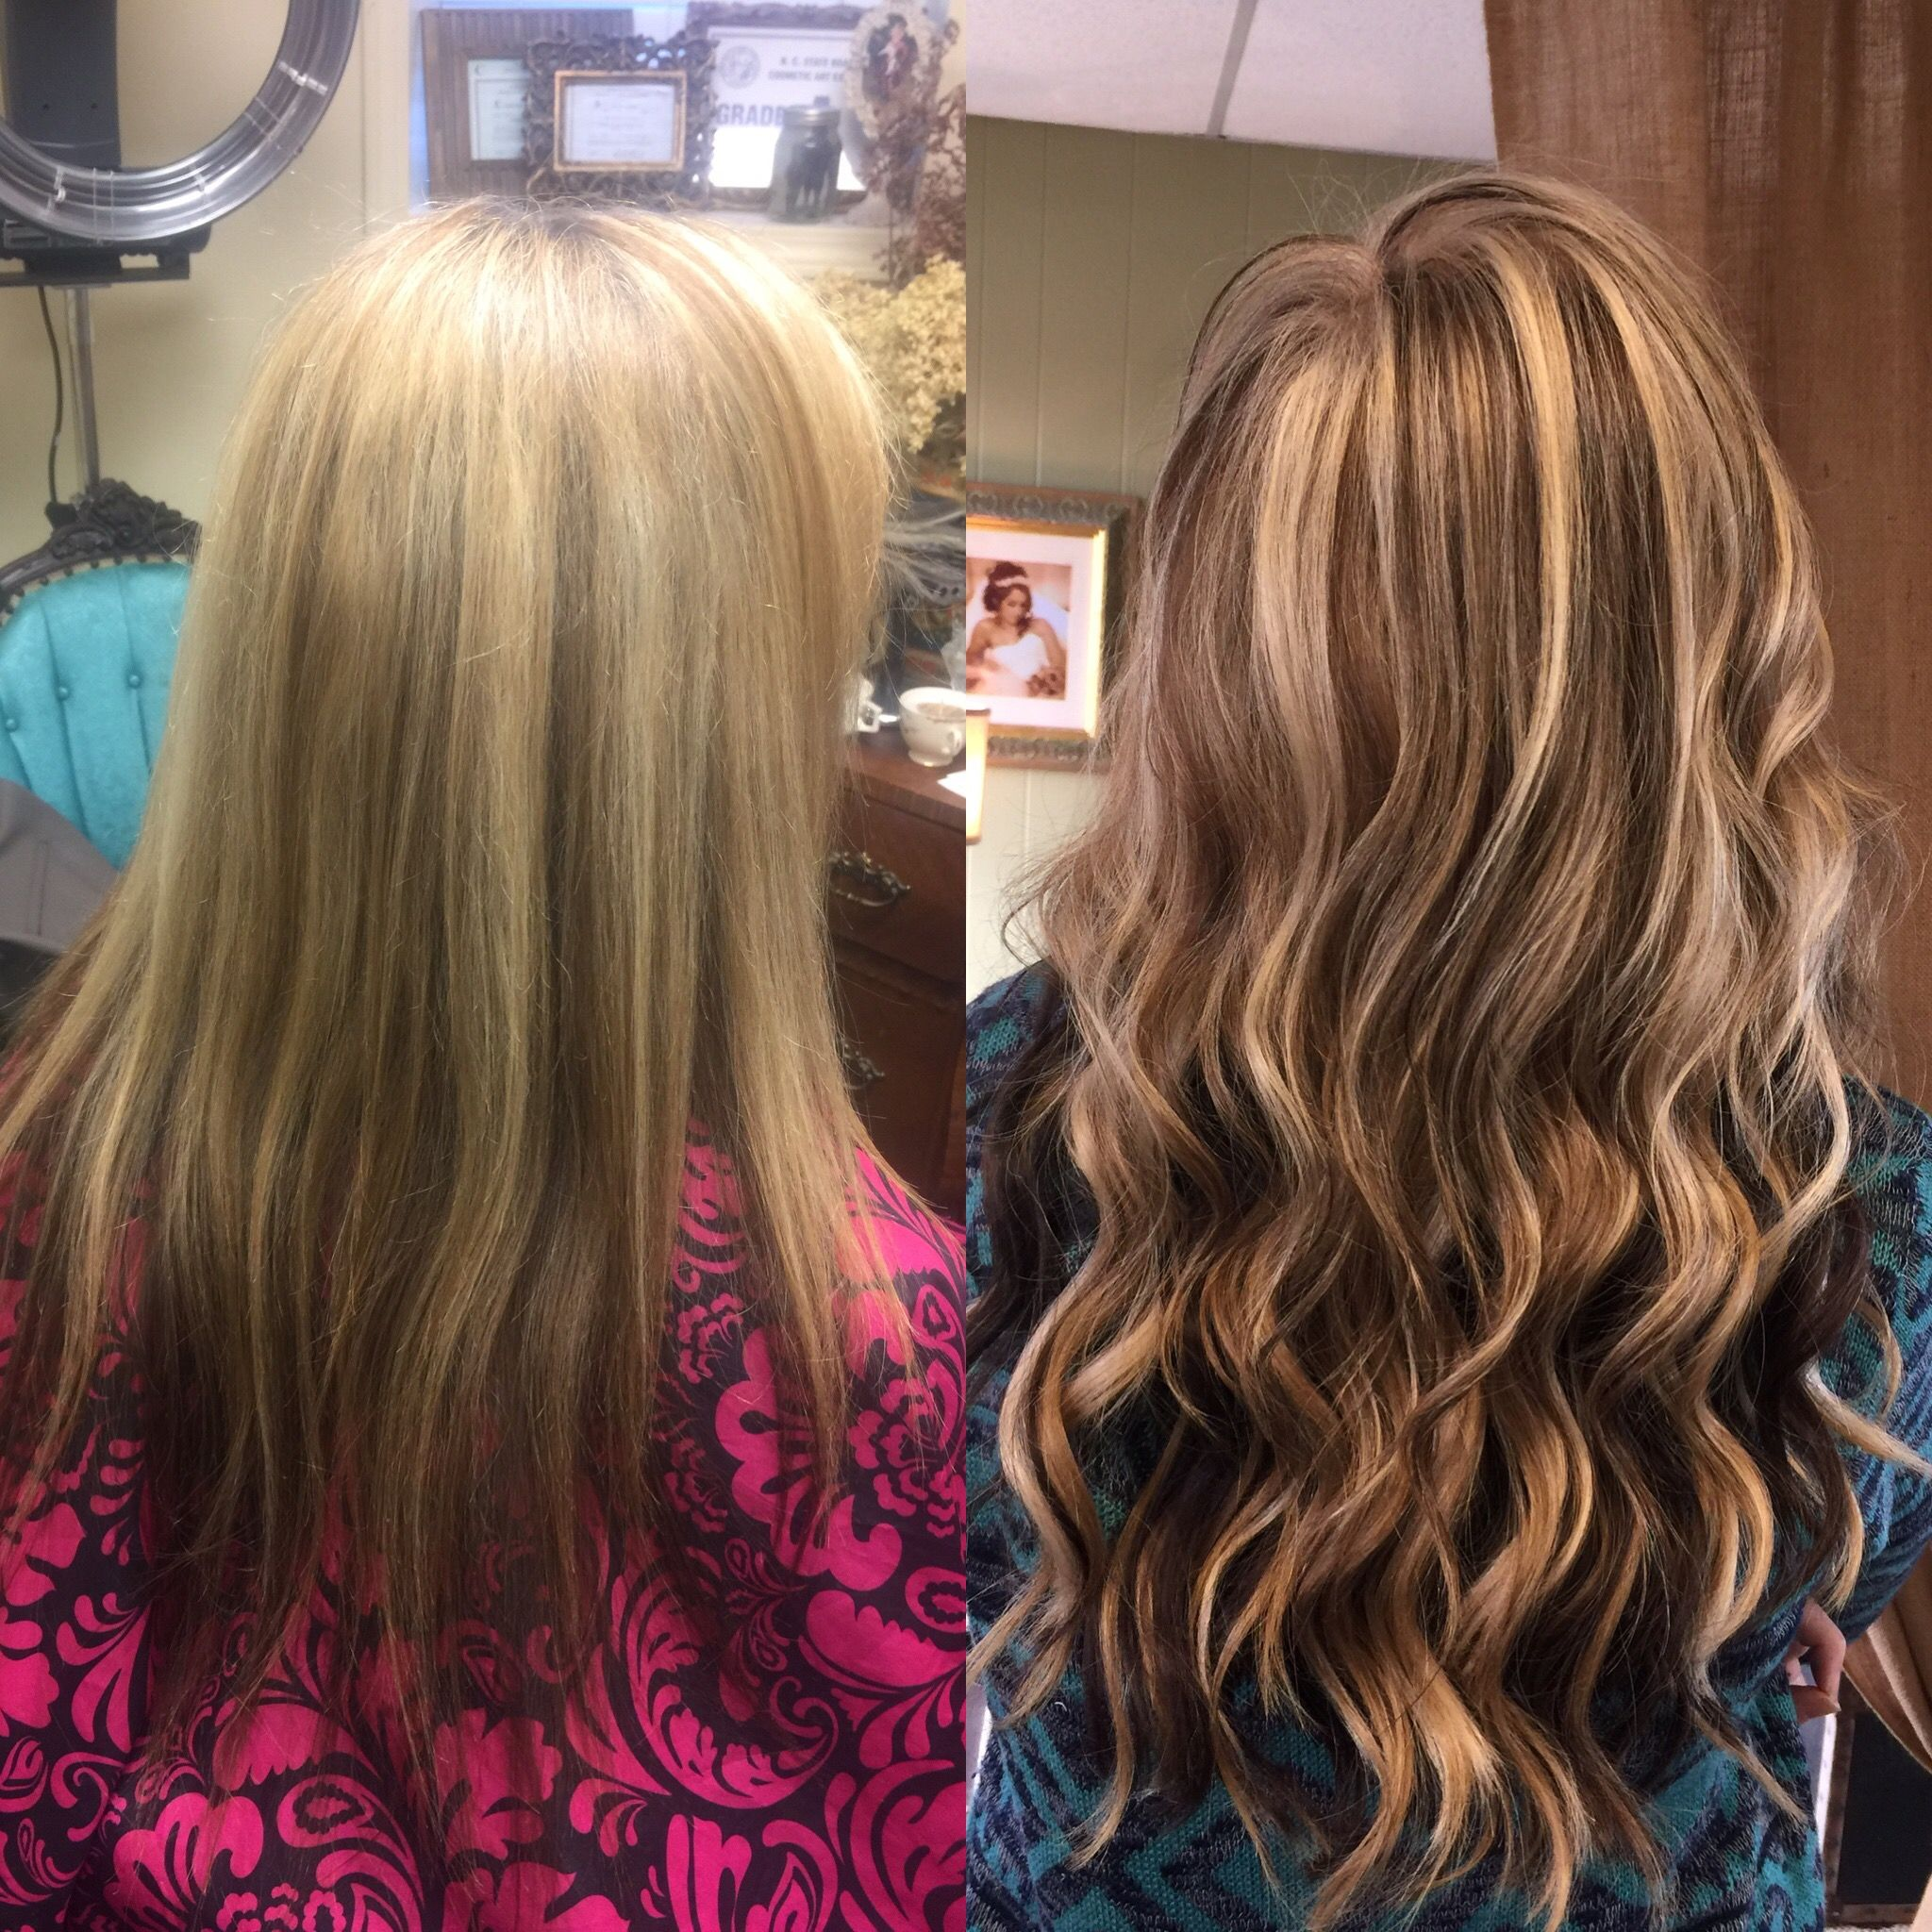 Extensions long hair styles hair styles wedding hairstyles